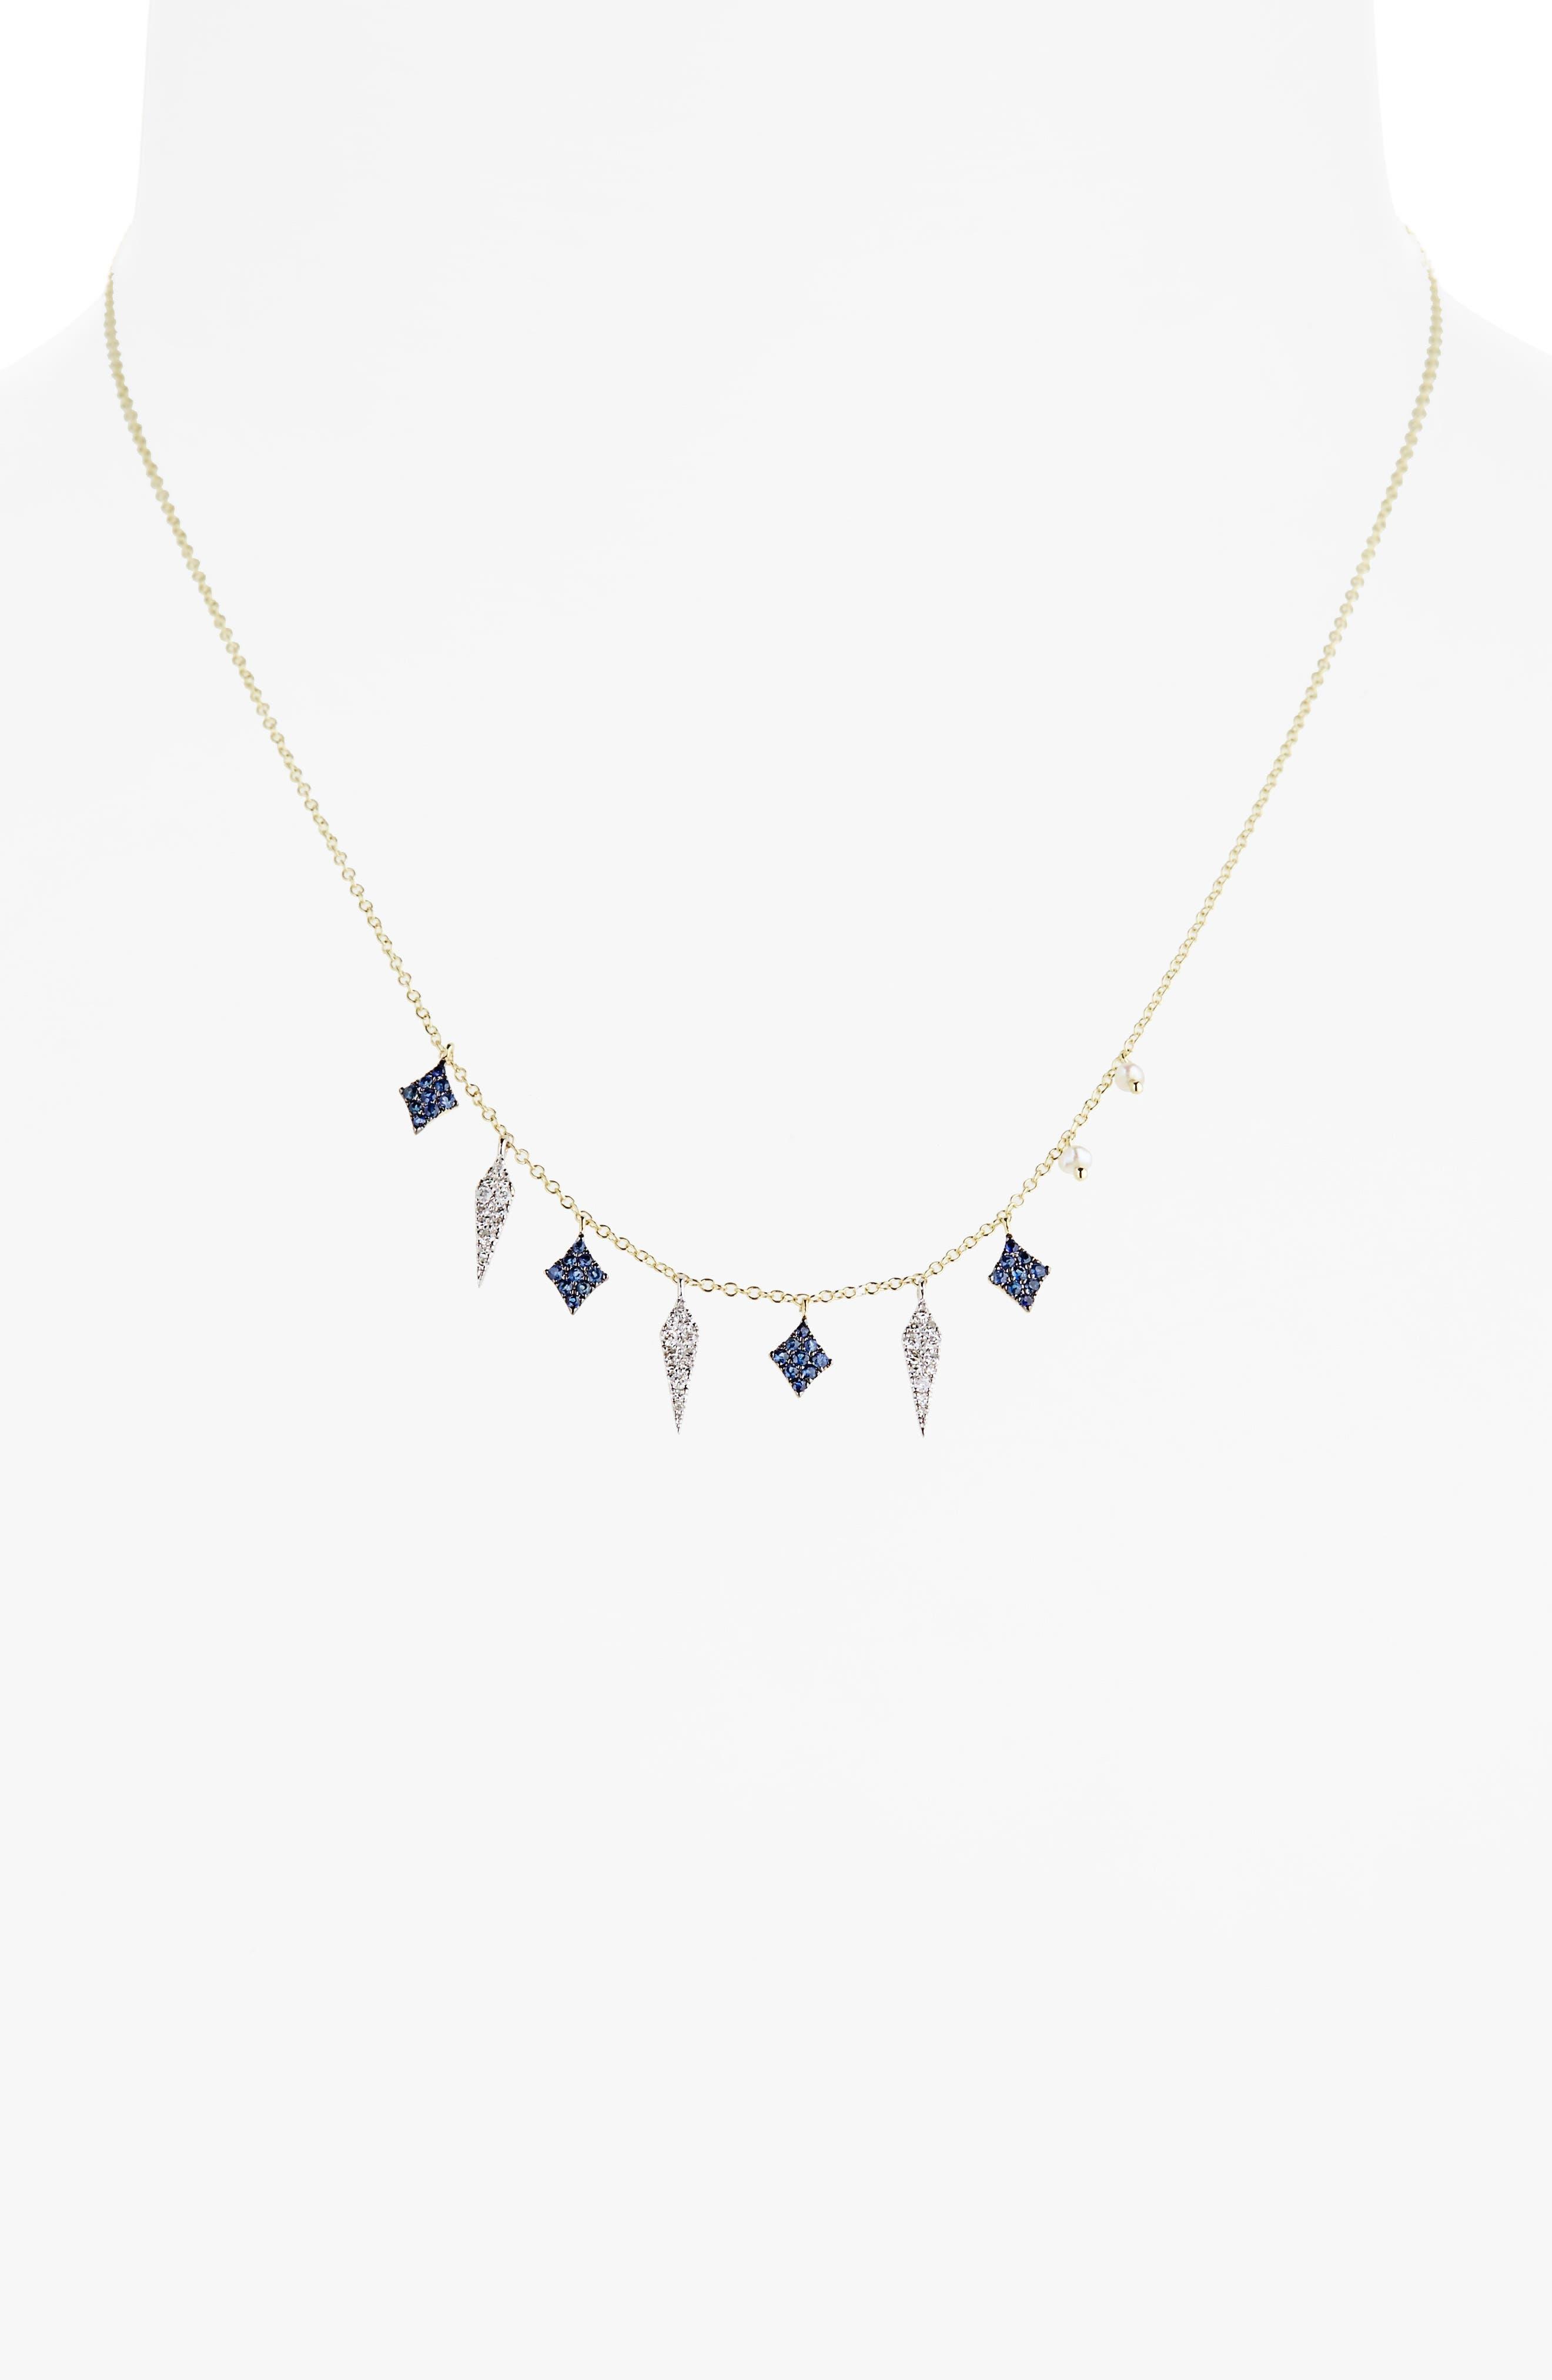 Main Image - Miera T Diamond & Sapphire Charm Necklace